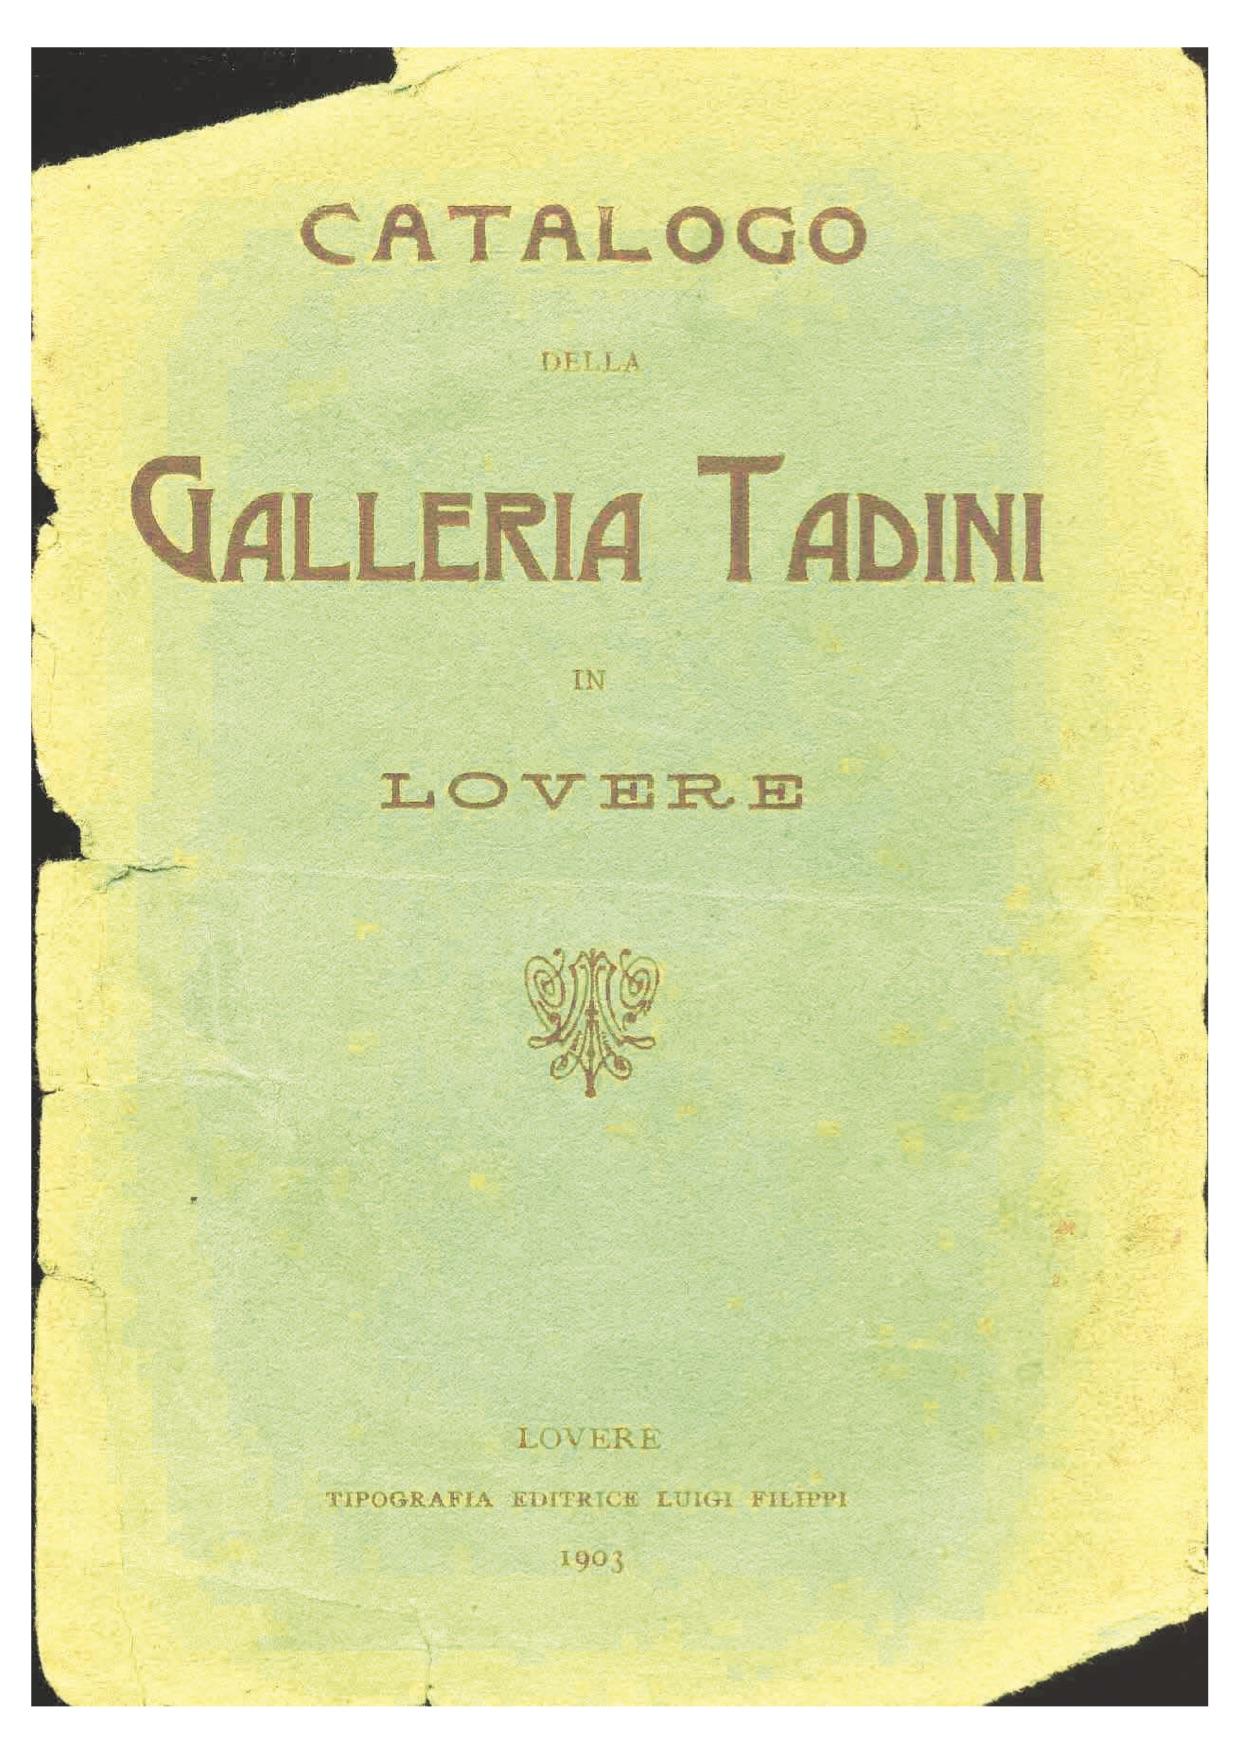 1903_Catalogo_FR